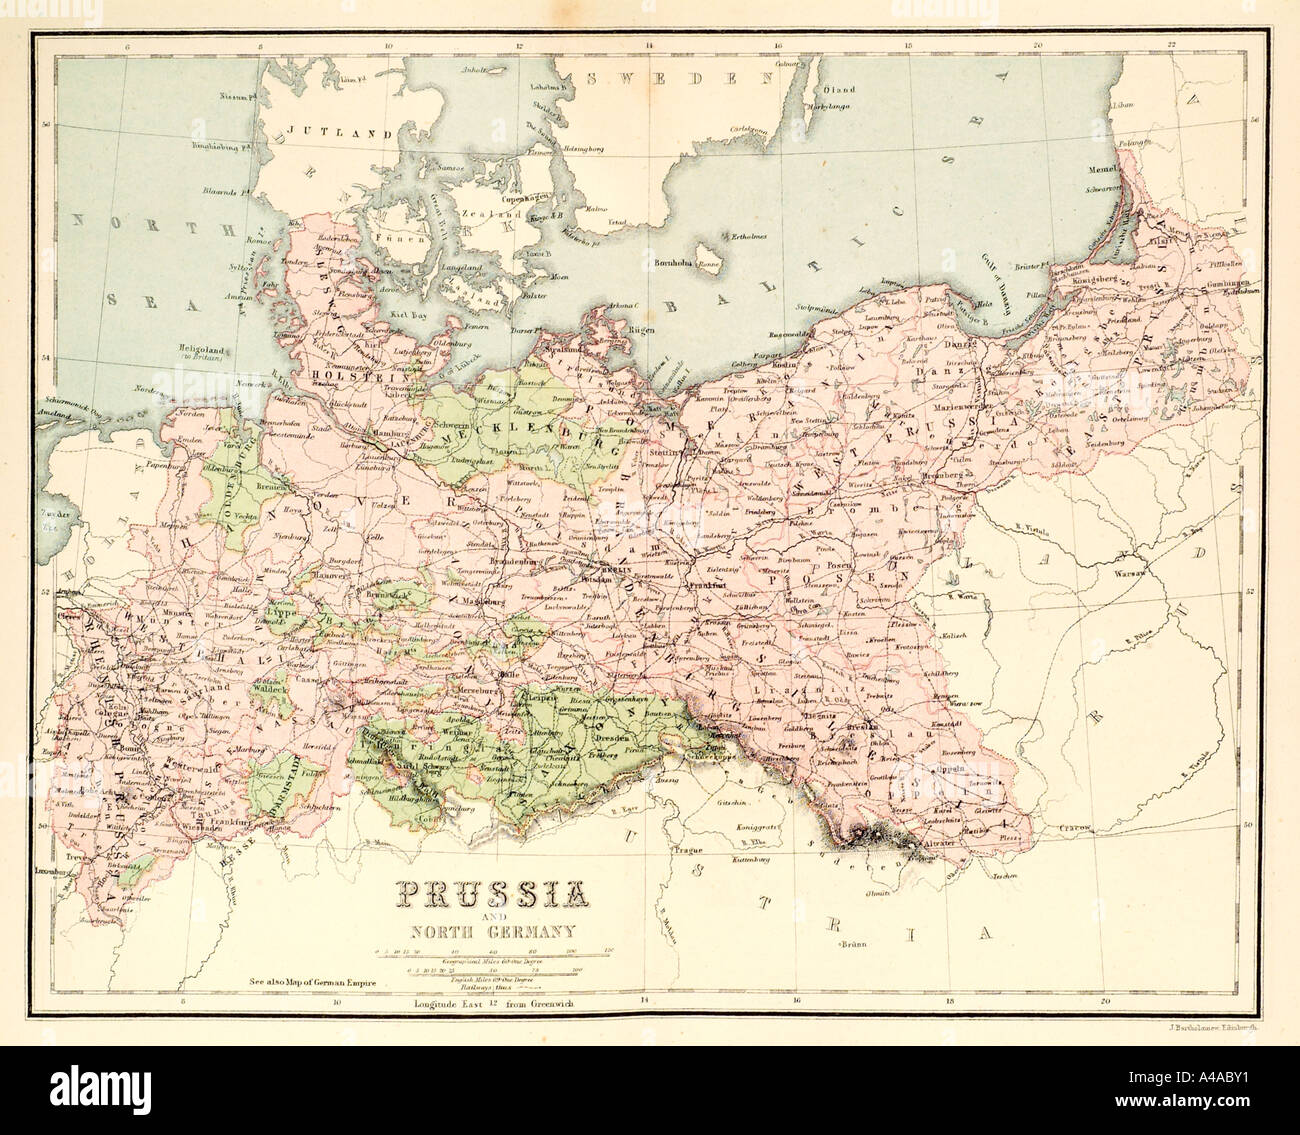 Cartographie Carte plan de Prusse naviguer route europe road river Photo Stock